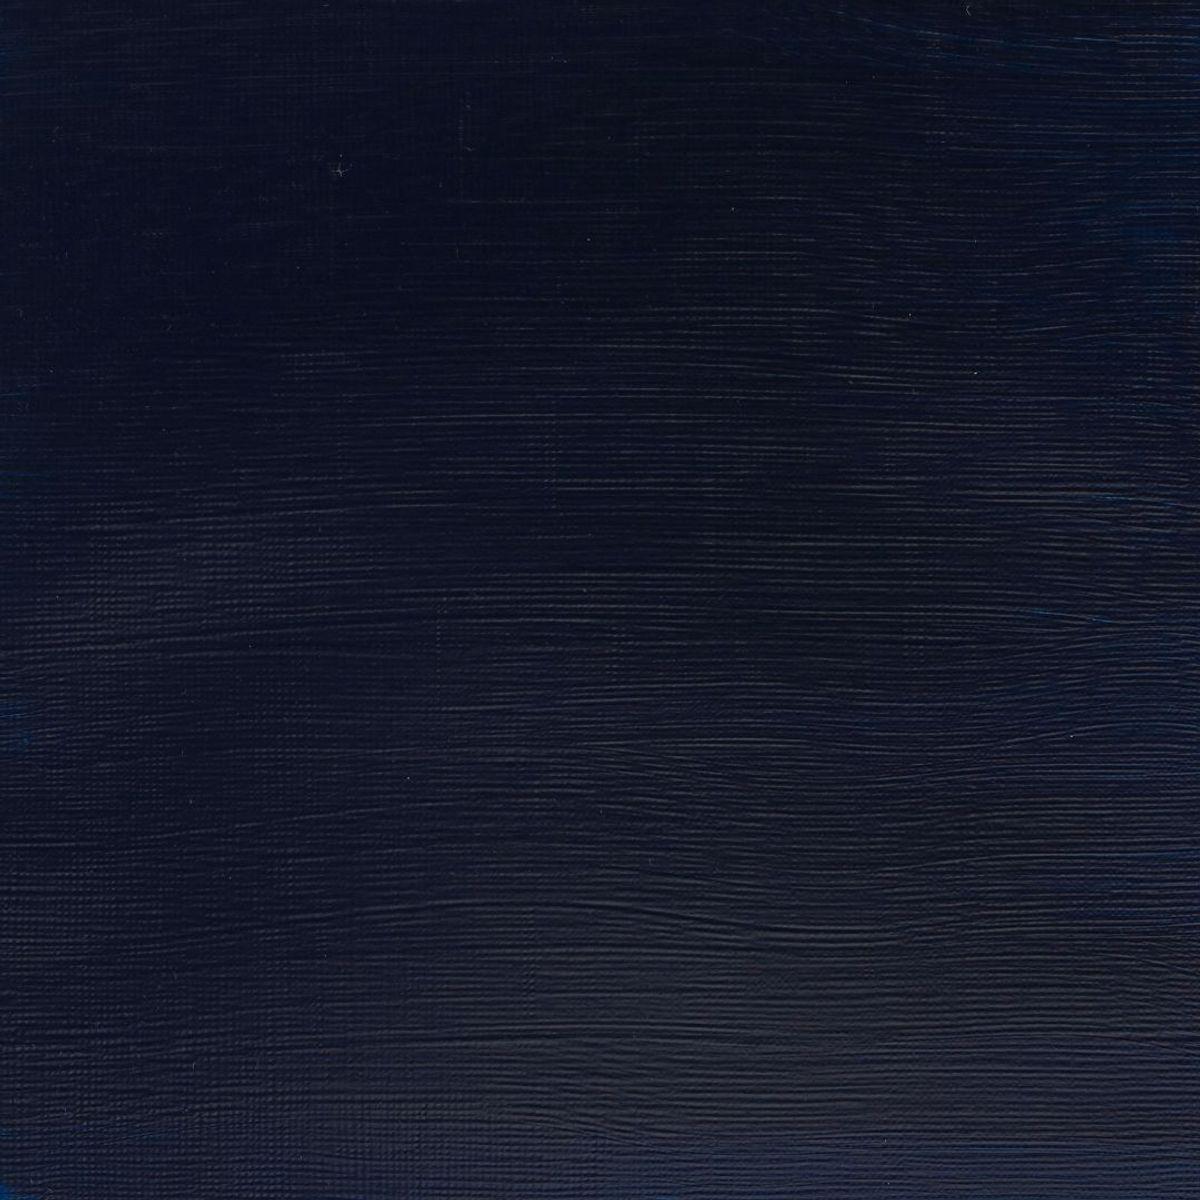 WINSOR AND NEWTON GALERIA ACRYLIC COLOUR - TUBE OF 60 ML - PRUSSIAN BLUE HUE (541)